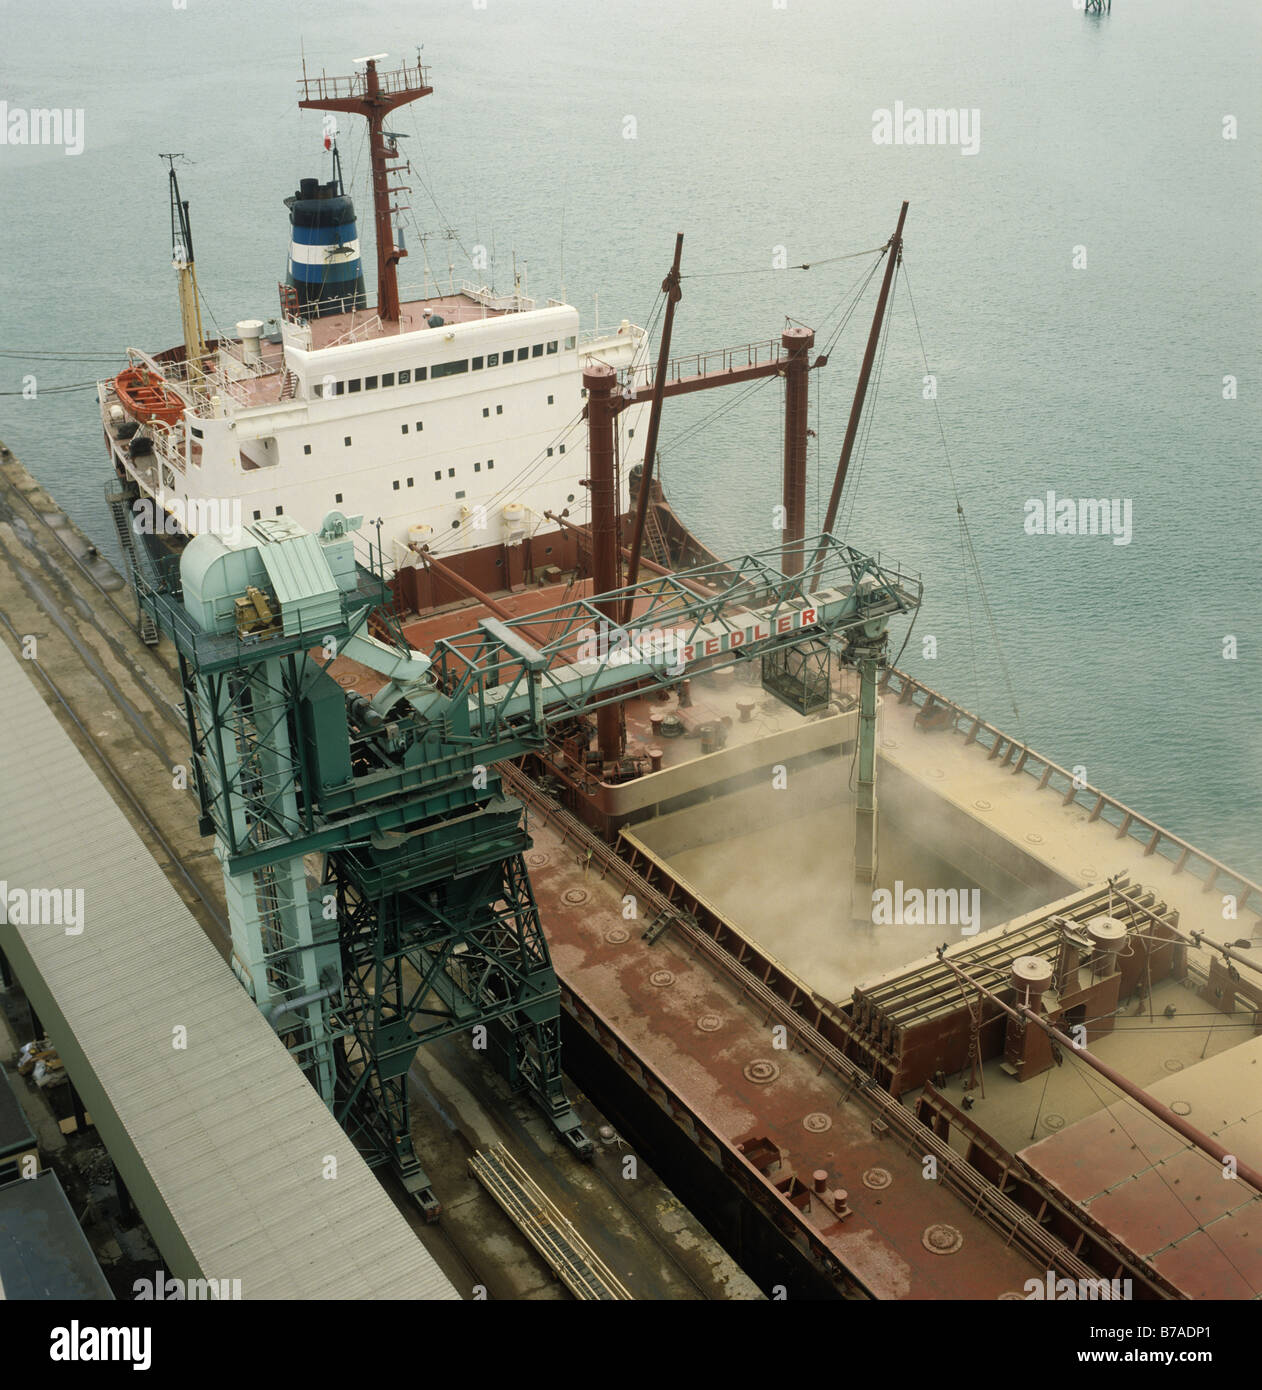 Looking down on a 26000 ton Lebanese grain ship loading its cargo at Southampton Docks - Stock Image